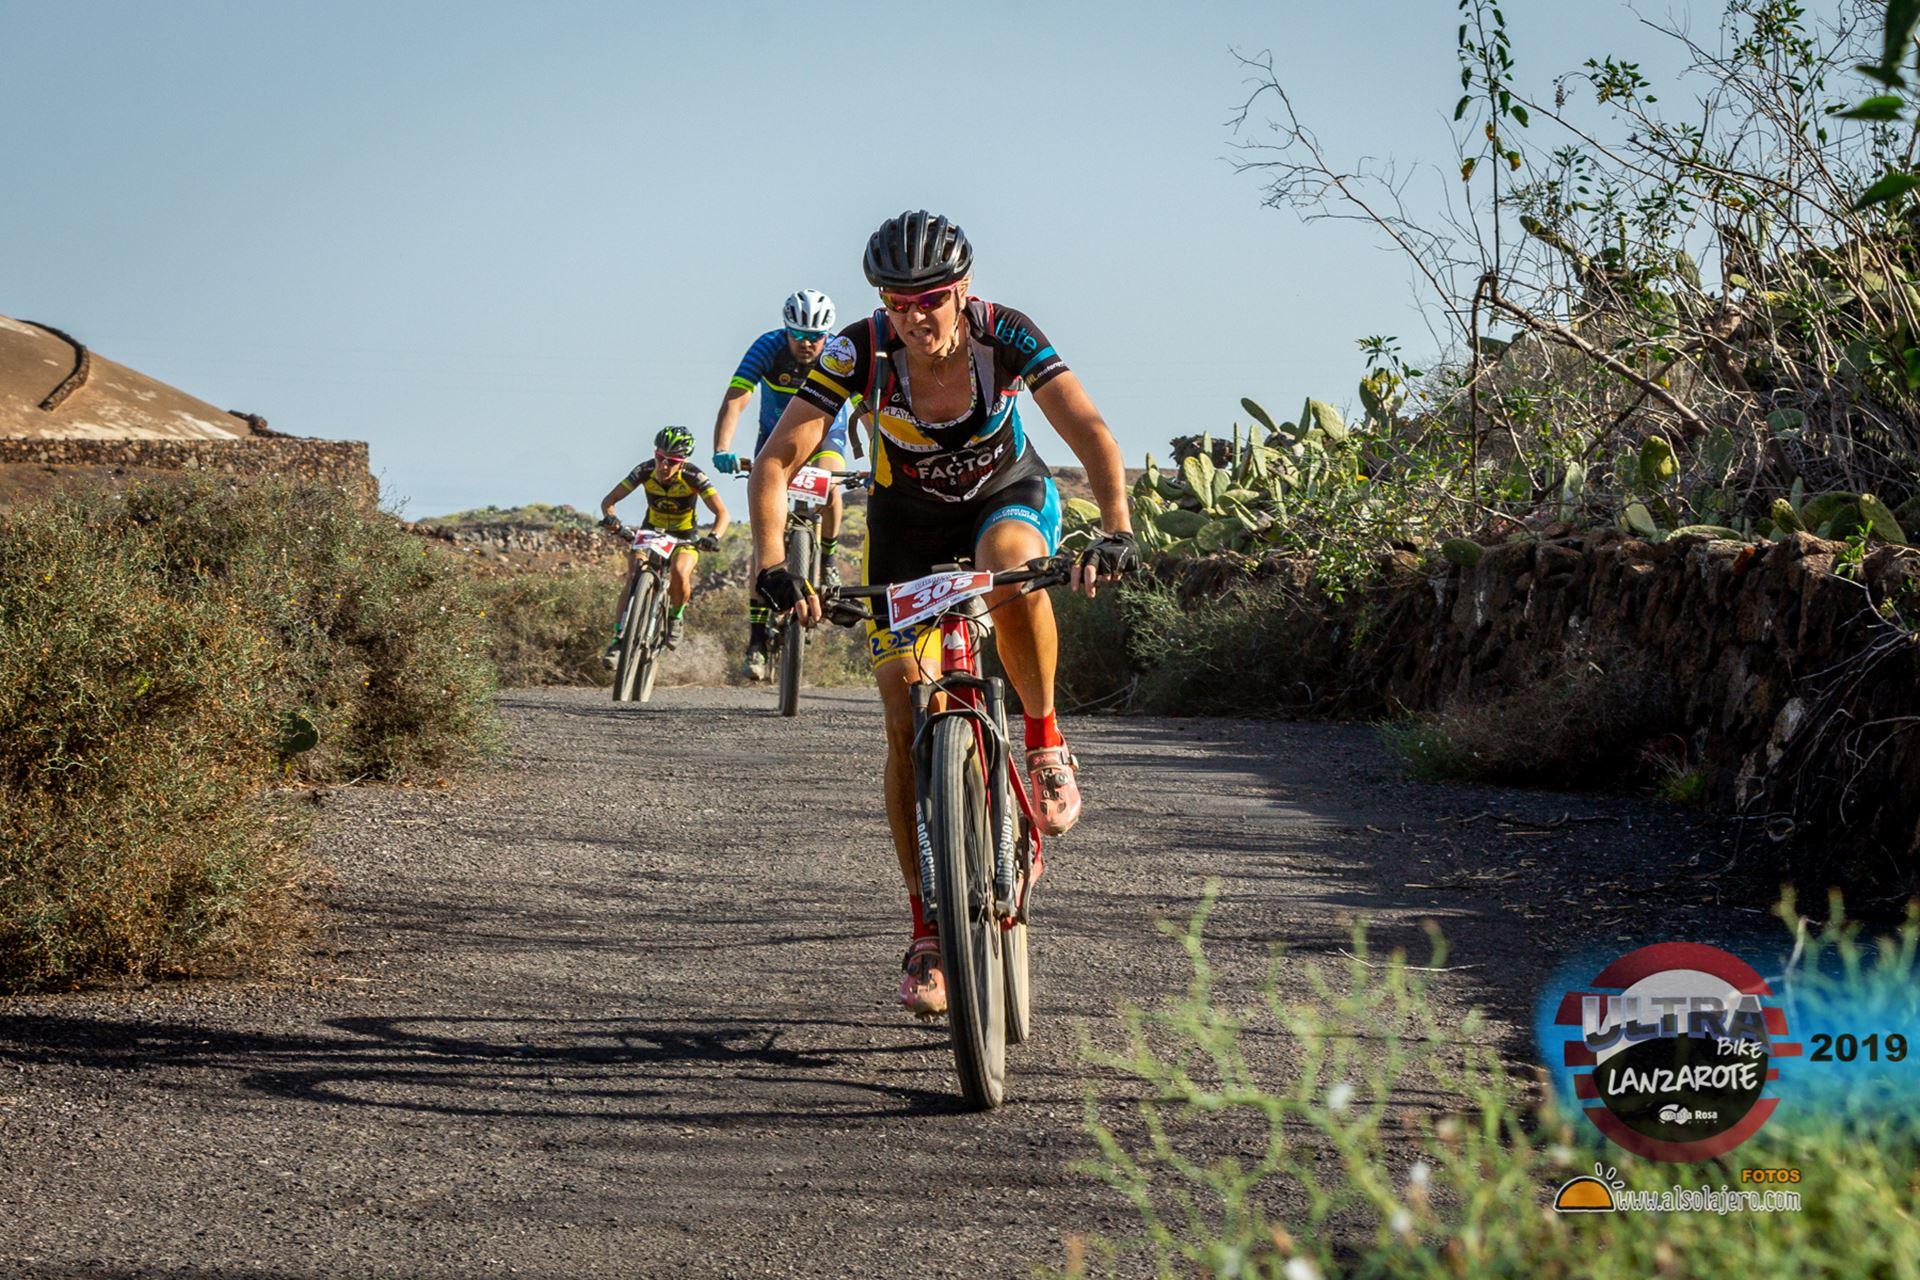 Sector Guatiza 2ª Etapa Ultrabike 2019 Fotos Alsolajero.com-94